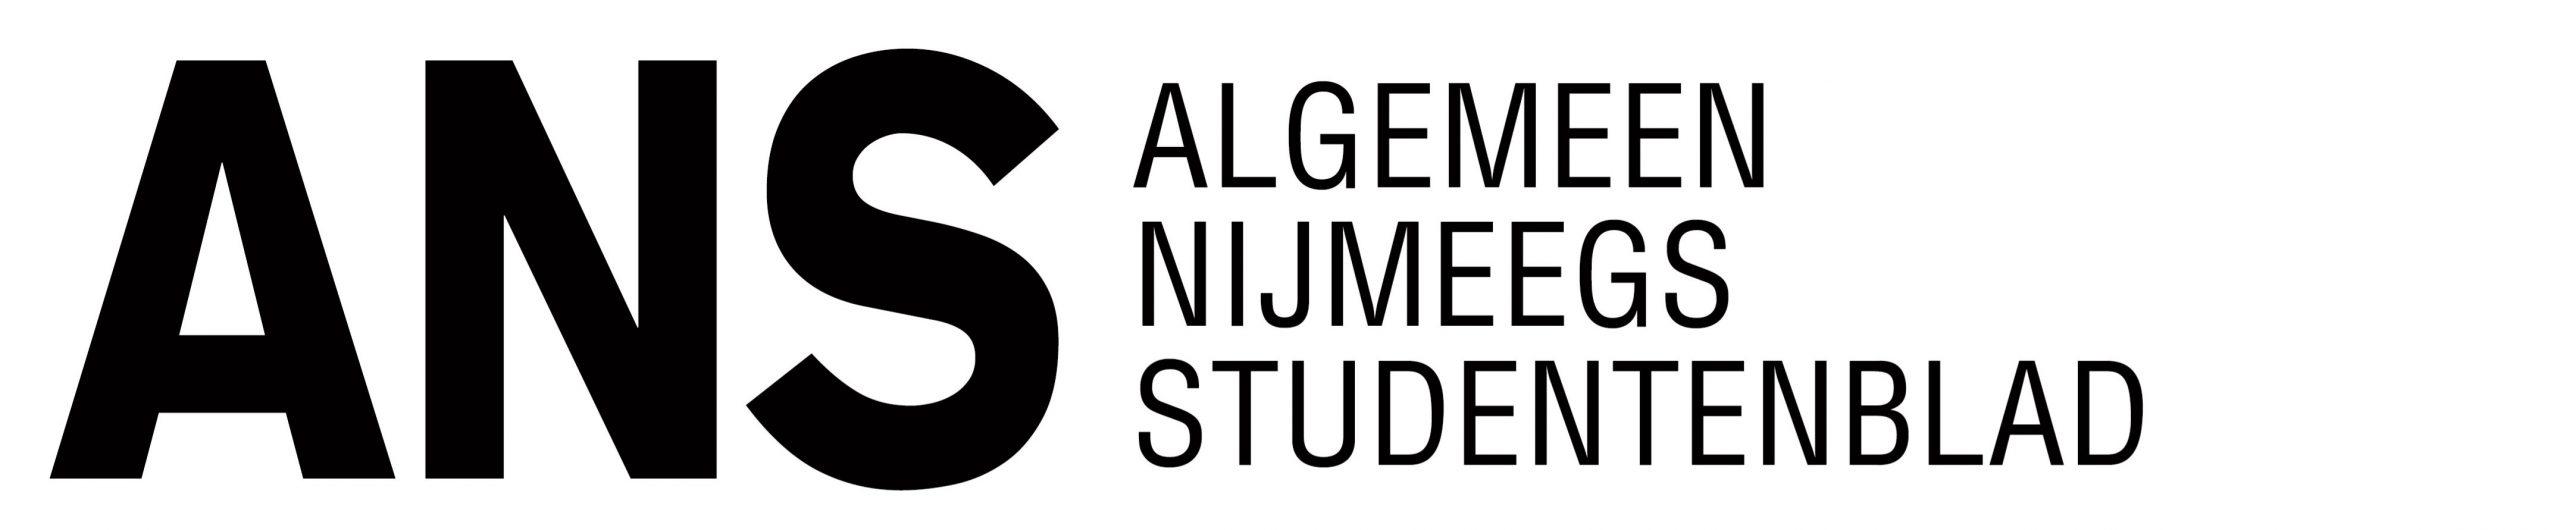 Algemeen Nijmeegs Studentenblad